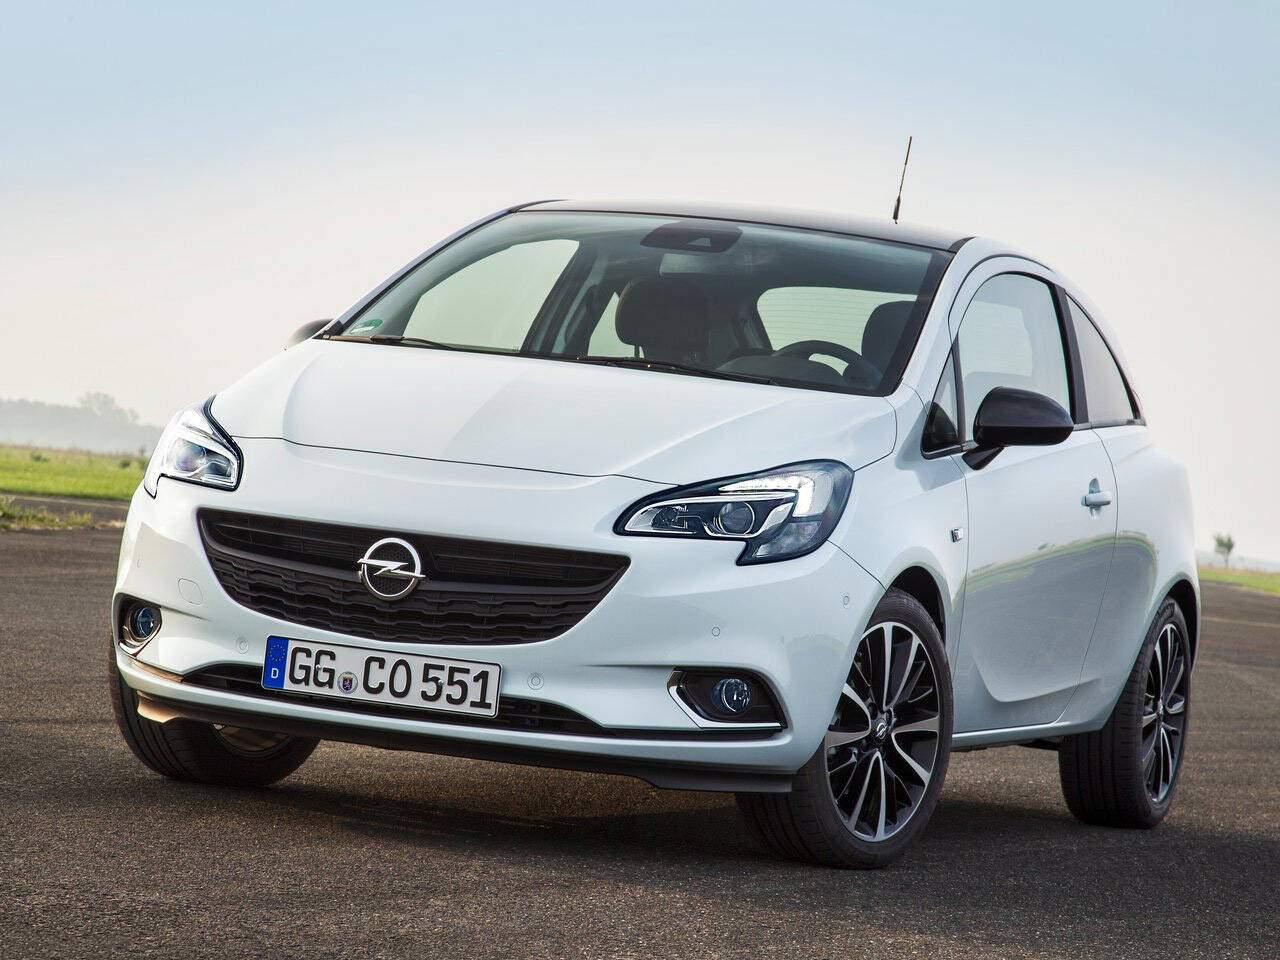 Opel Corsa V 1.3 CDTi 95 (2014-2018),  ajouté par fox58